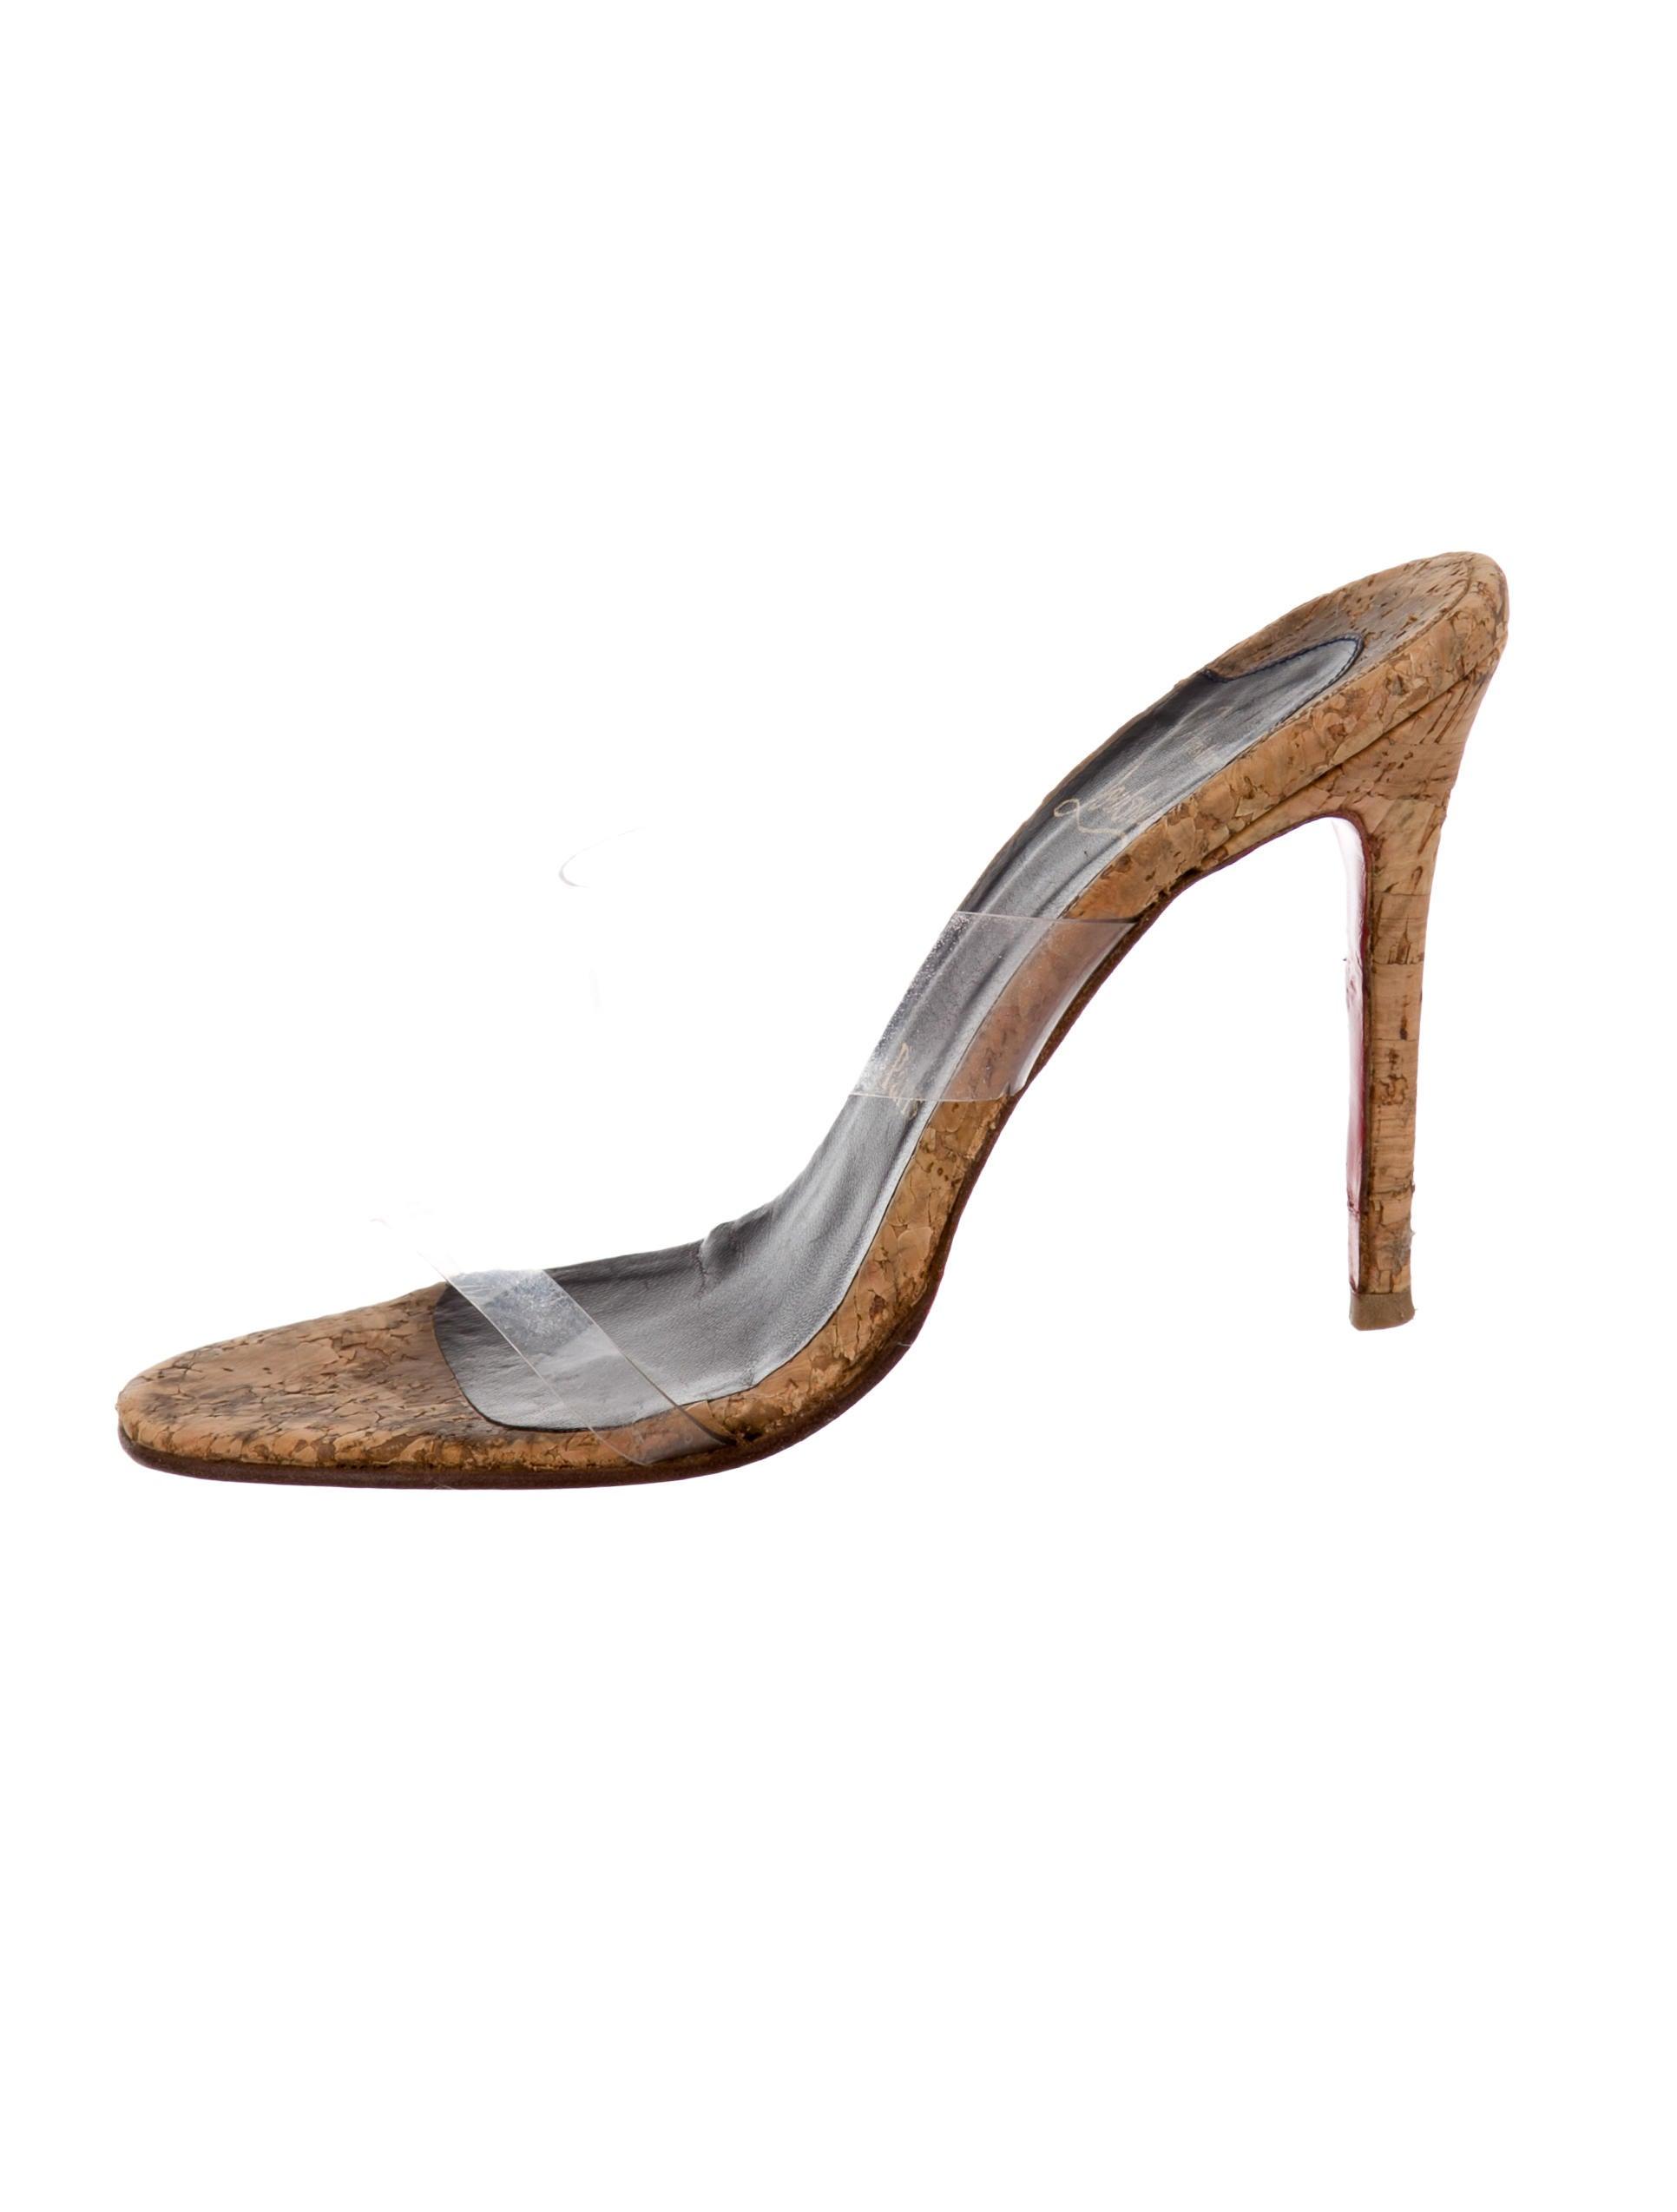 Christian Louboutin PVC Slide Sandals - Shoes - CHT44936 | The ...